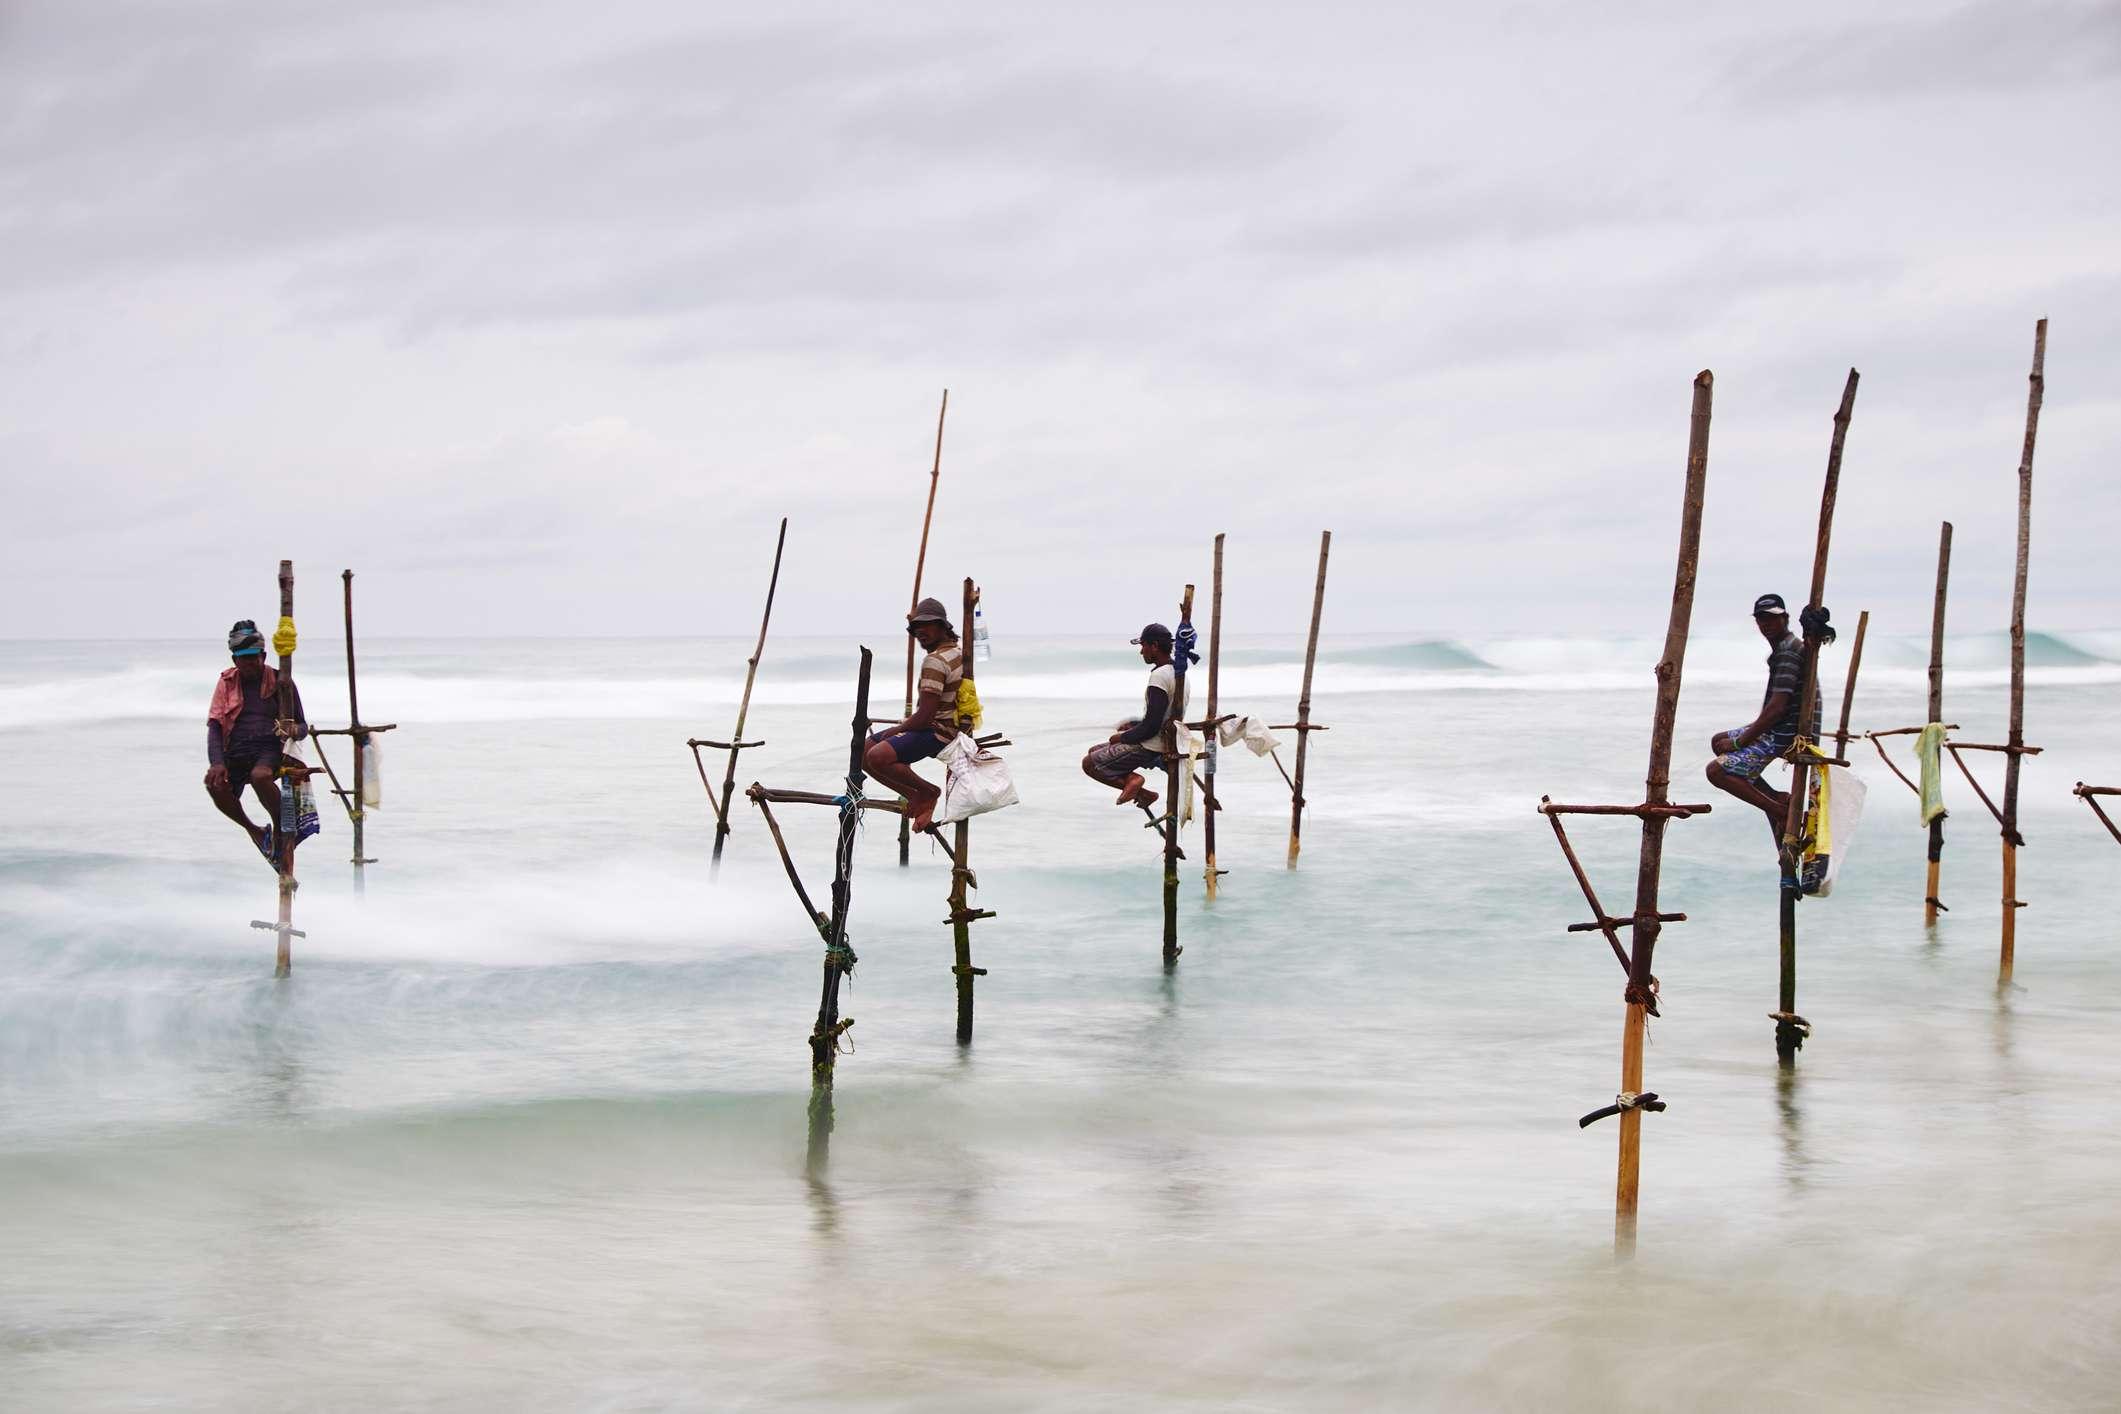 Stilt fishermen on the south coast of Sri Lanka, on Weligama beach, at dusk.